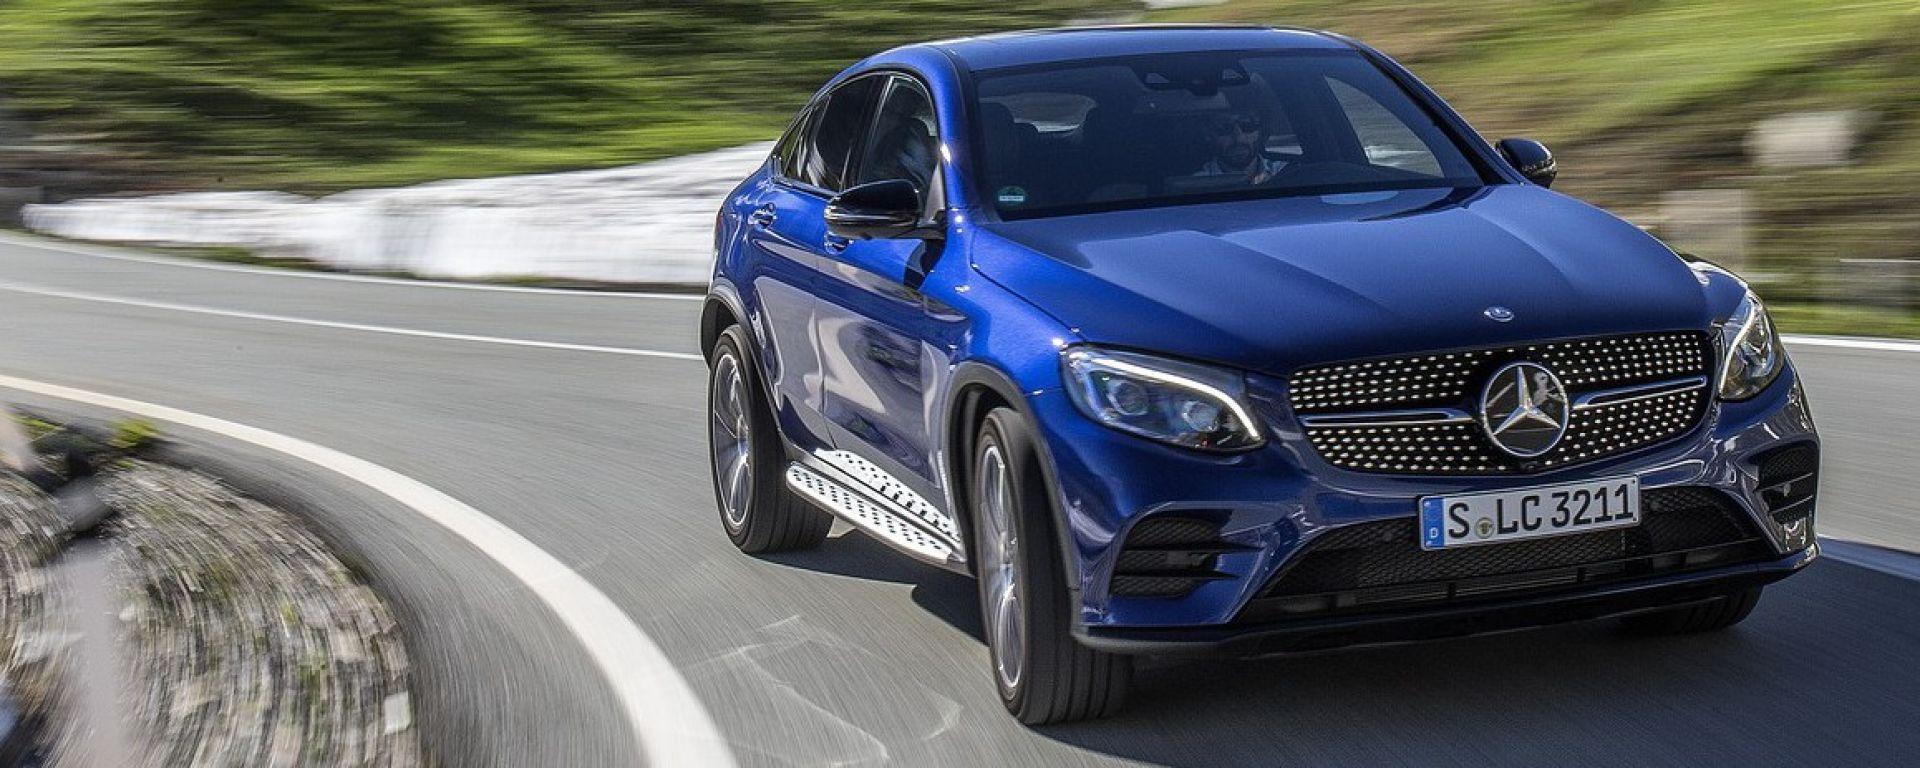 Mercedes GLC Coupé: la prova